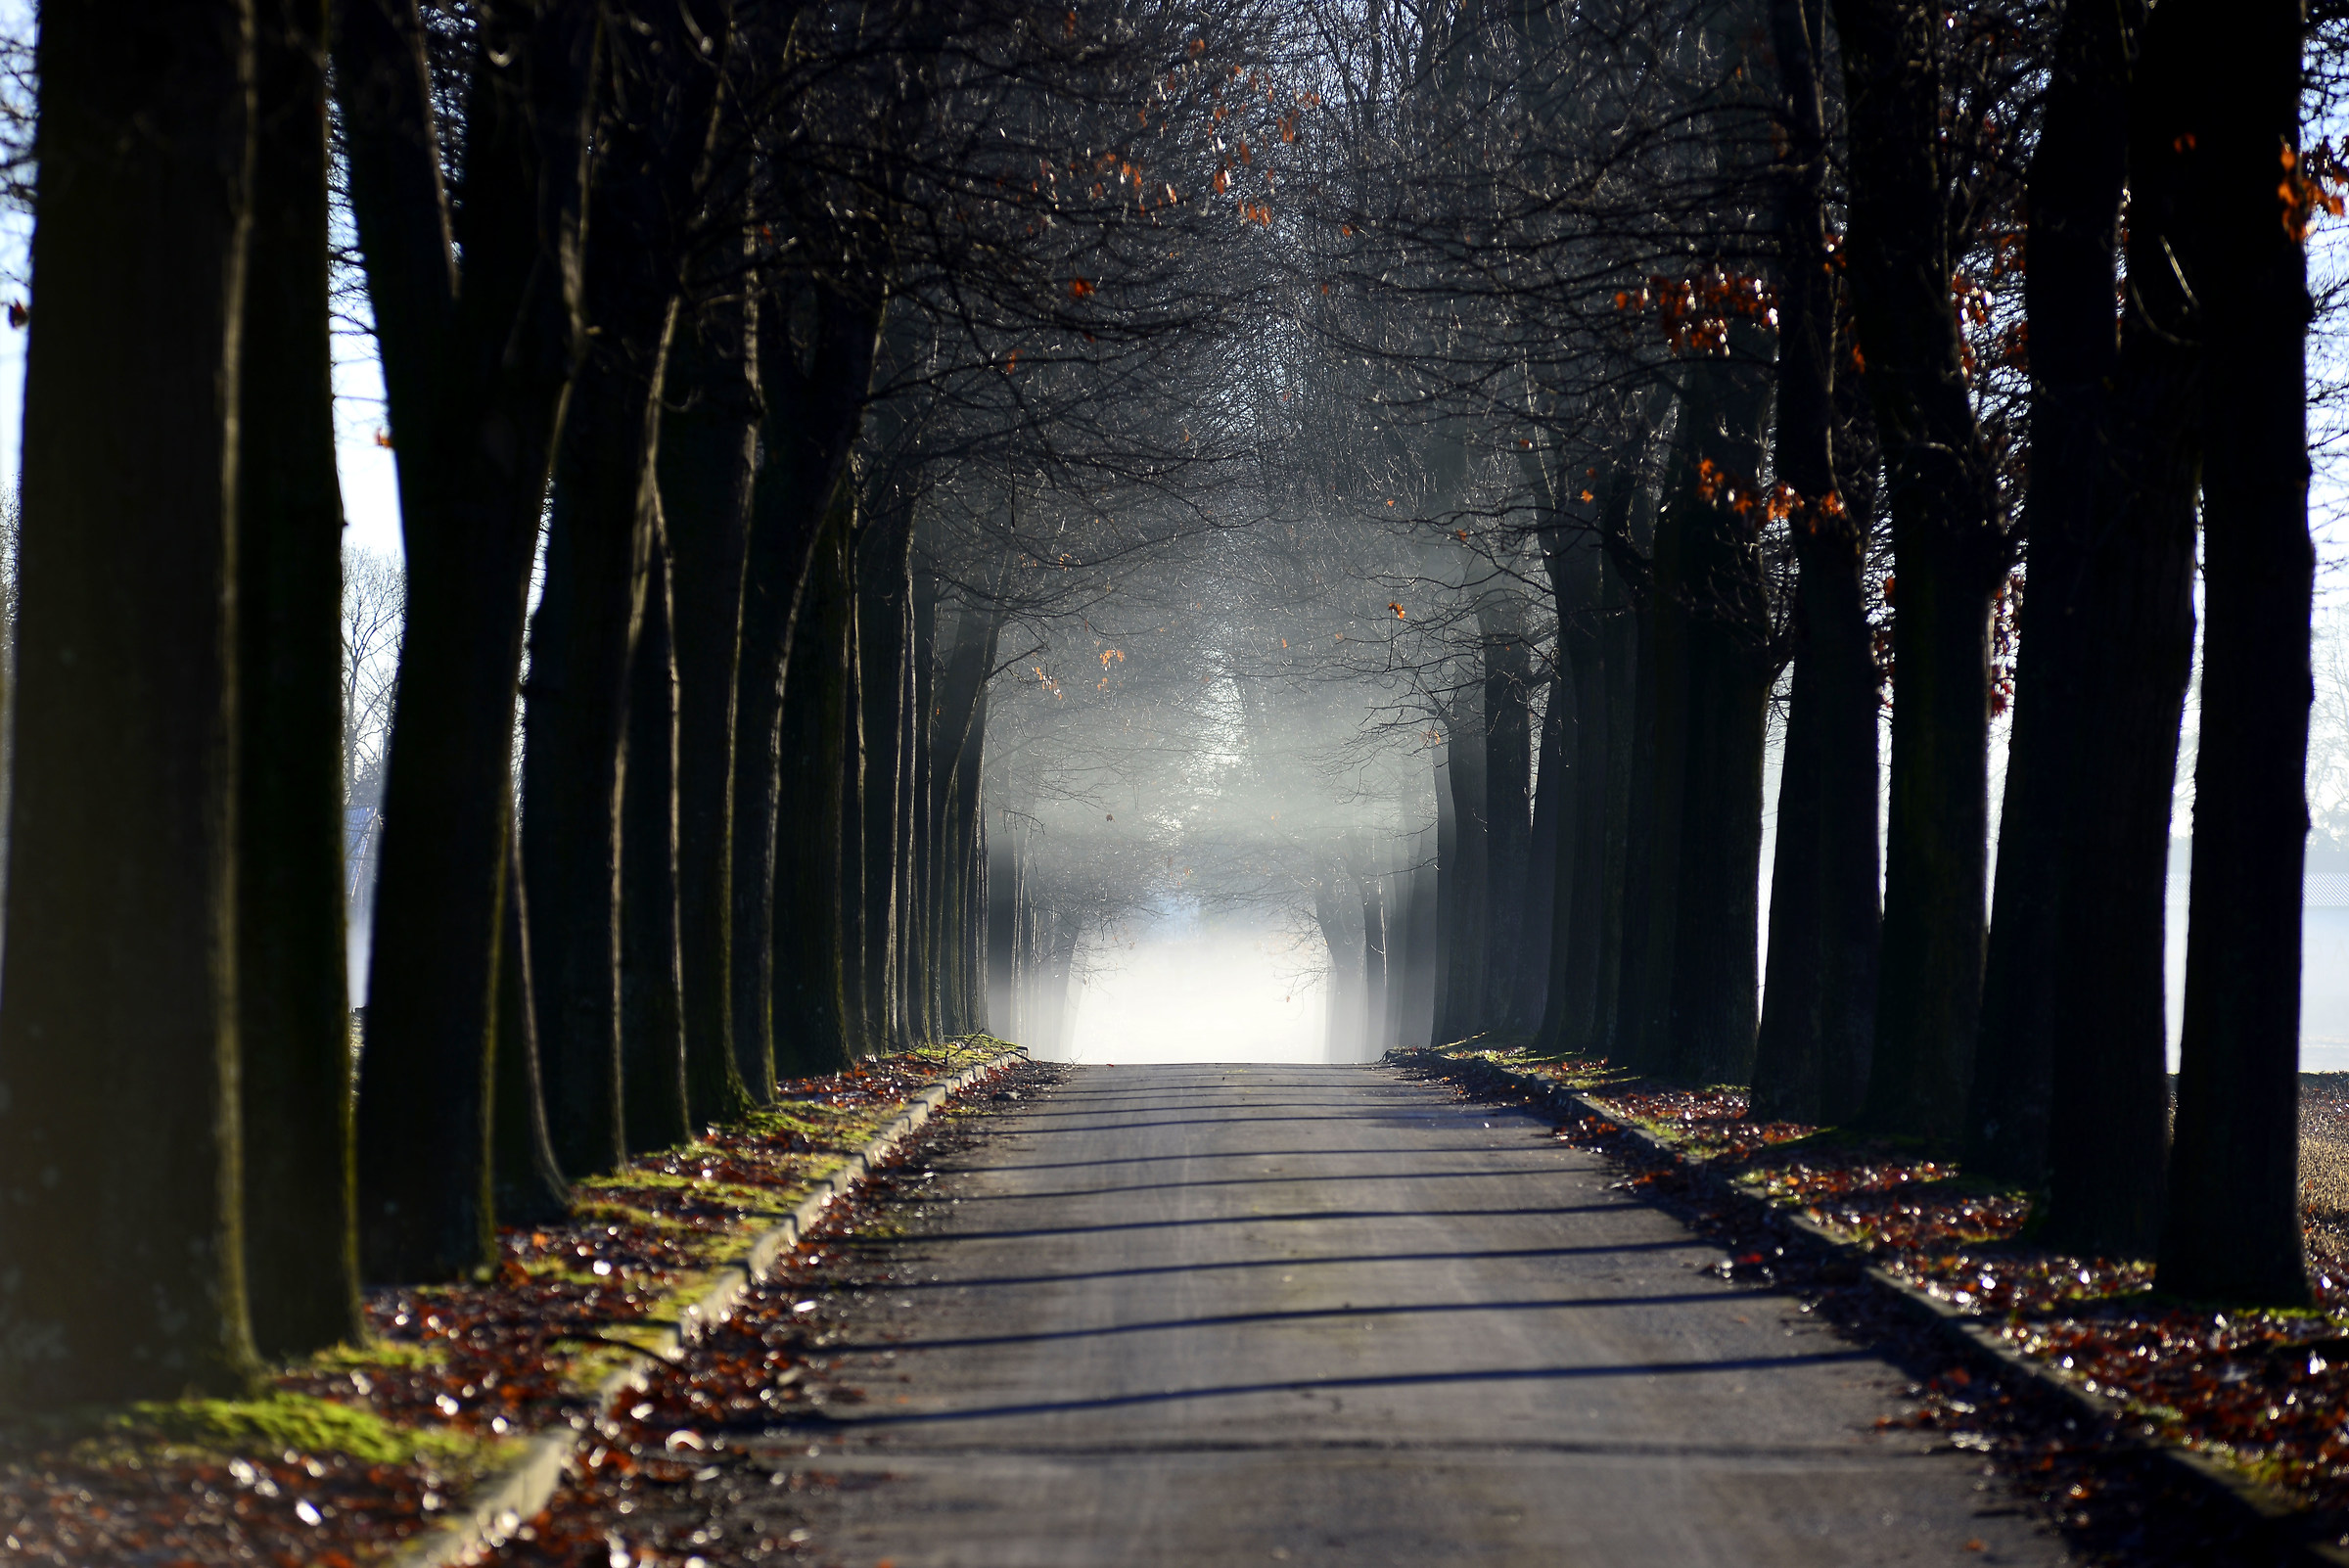 La via verso l'ignoto...